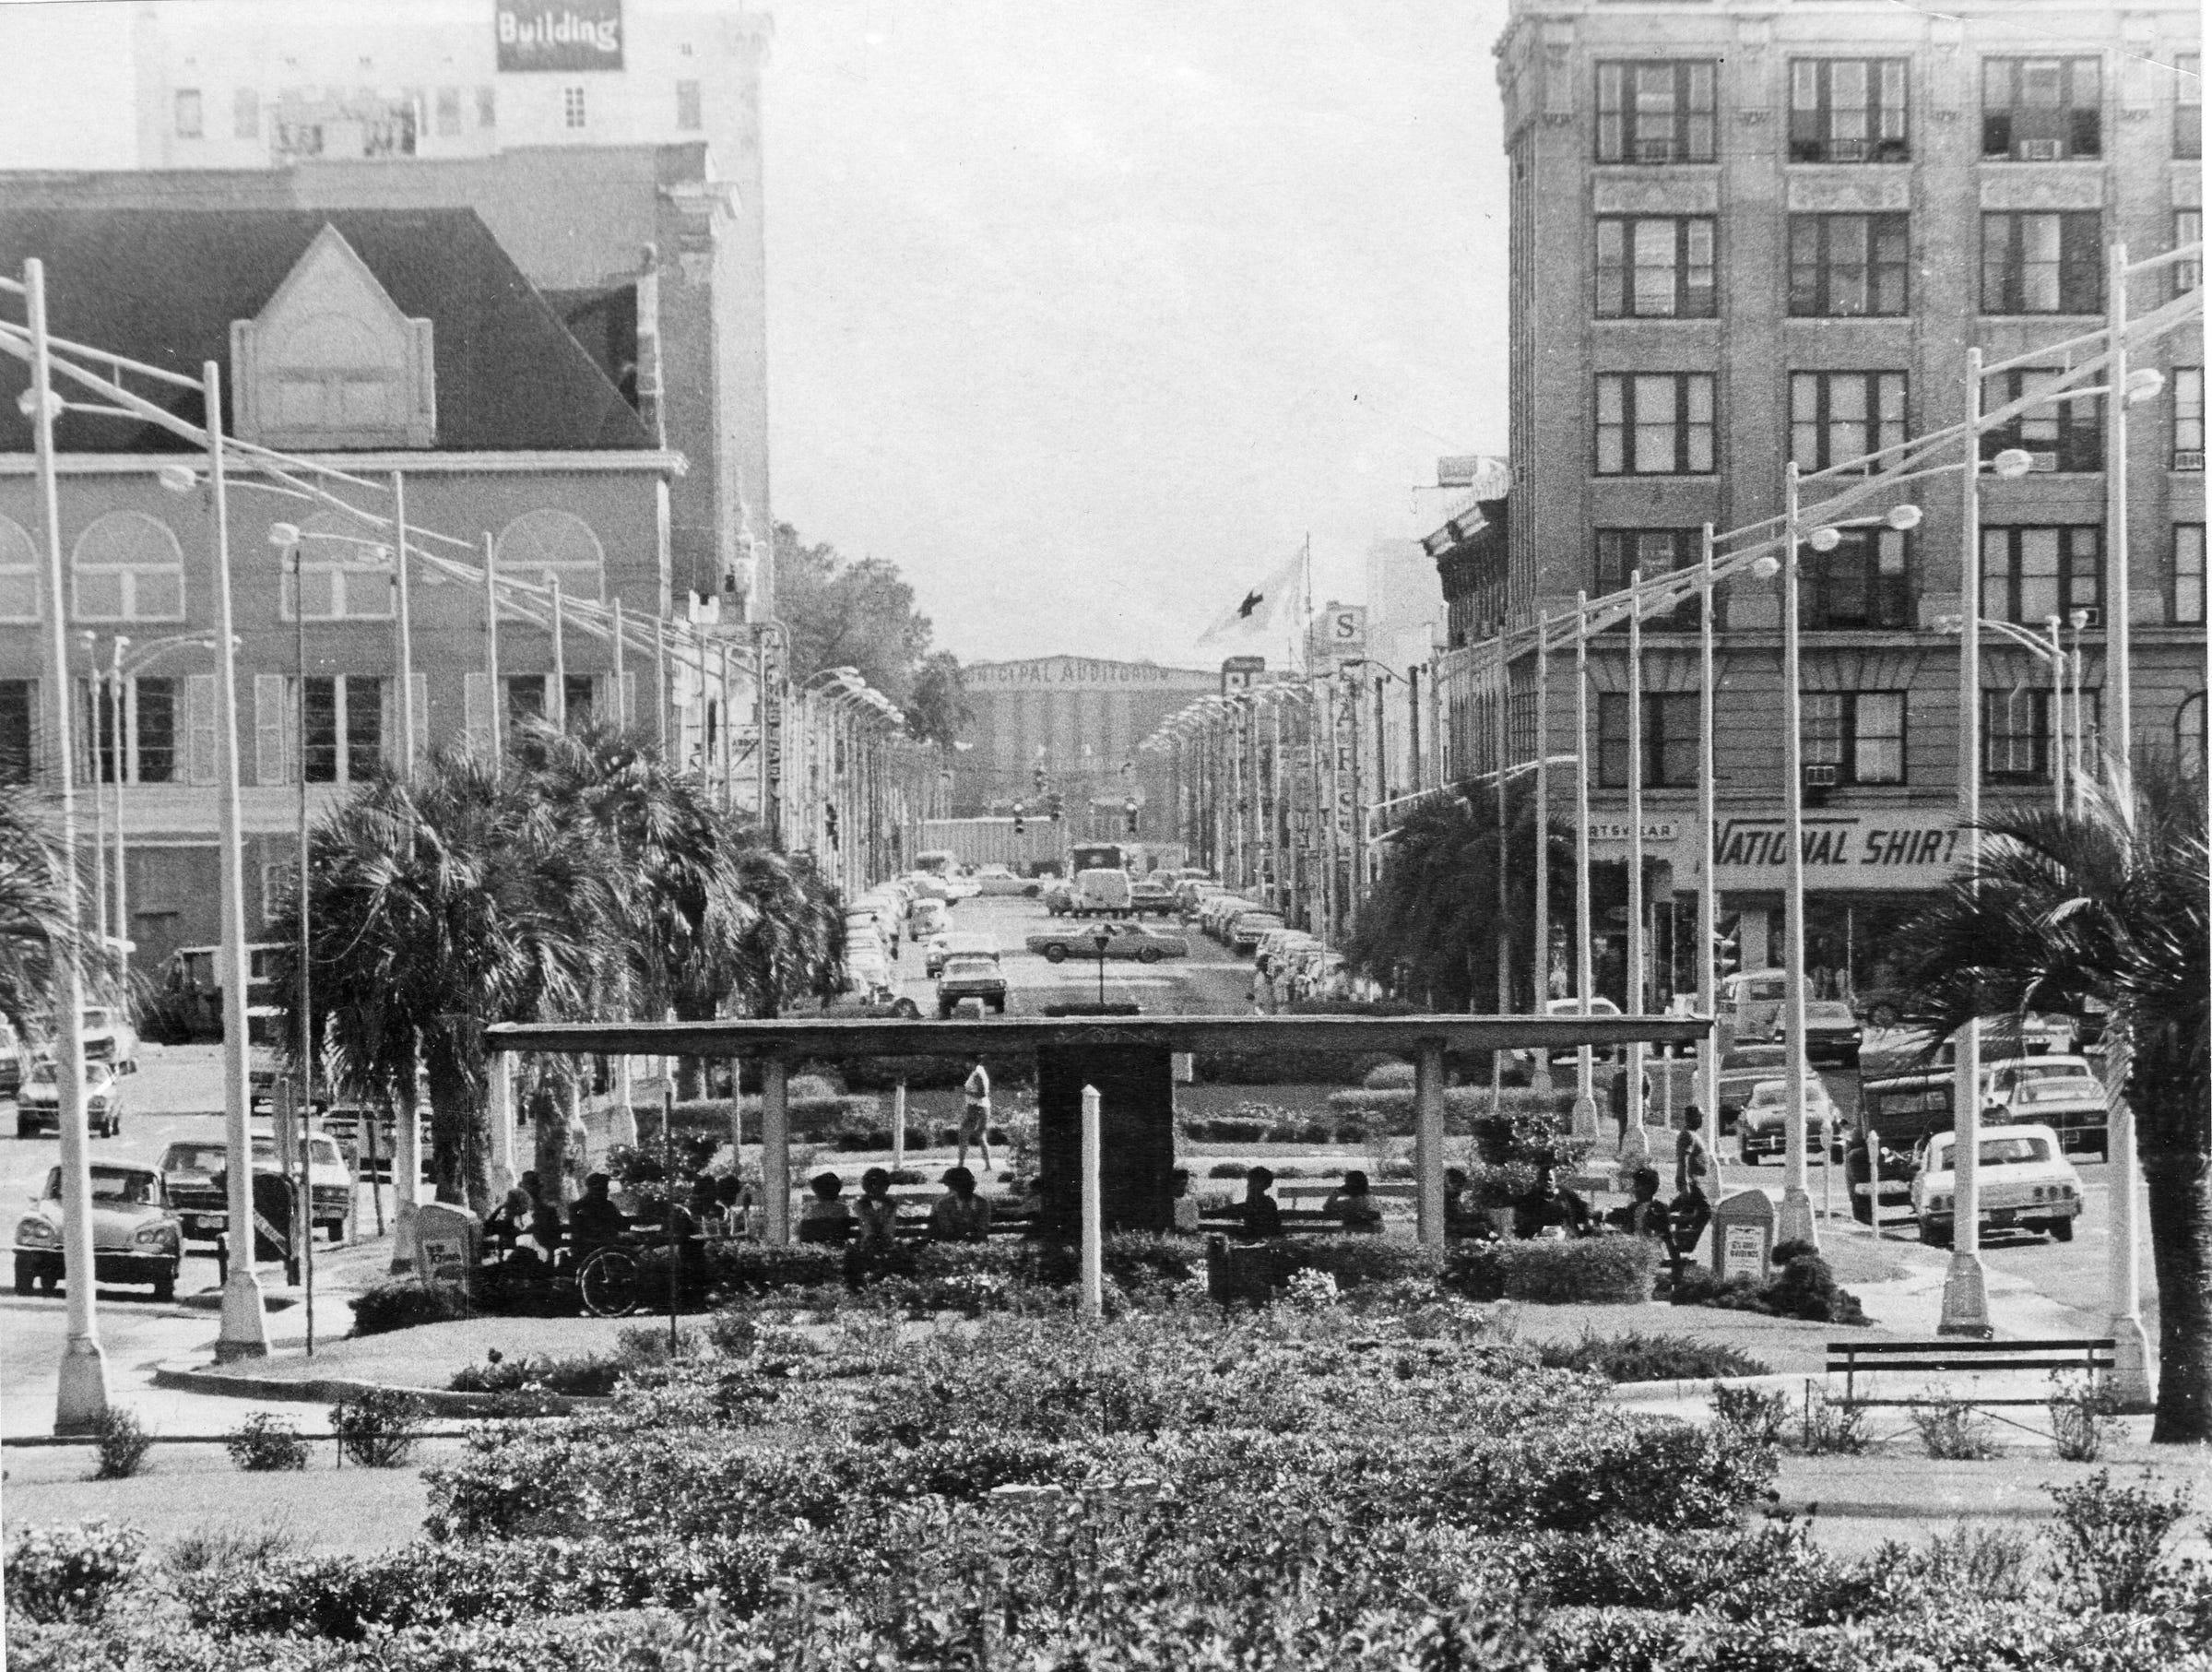 Palafox Street, 1970s.